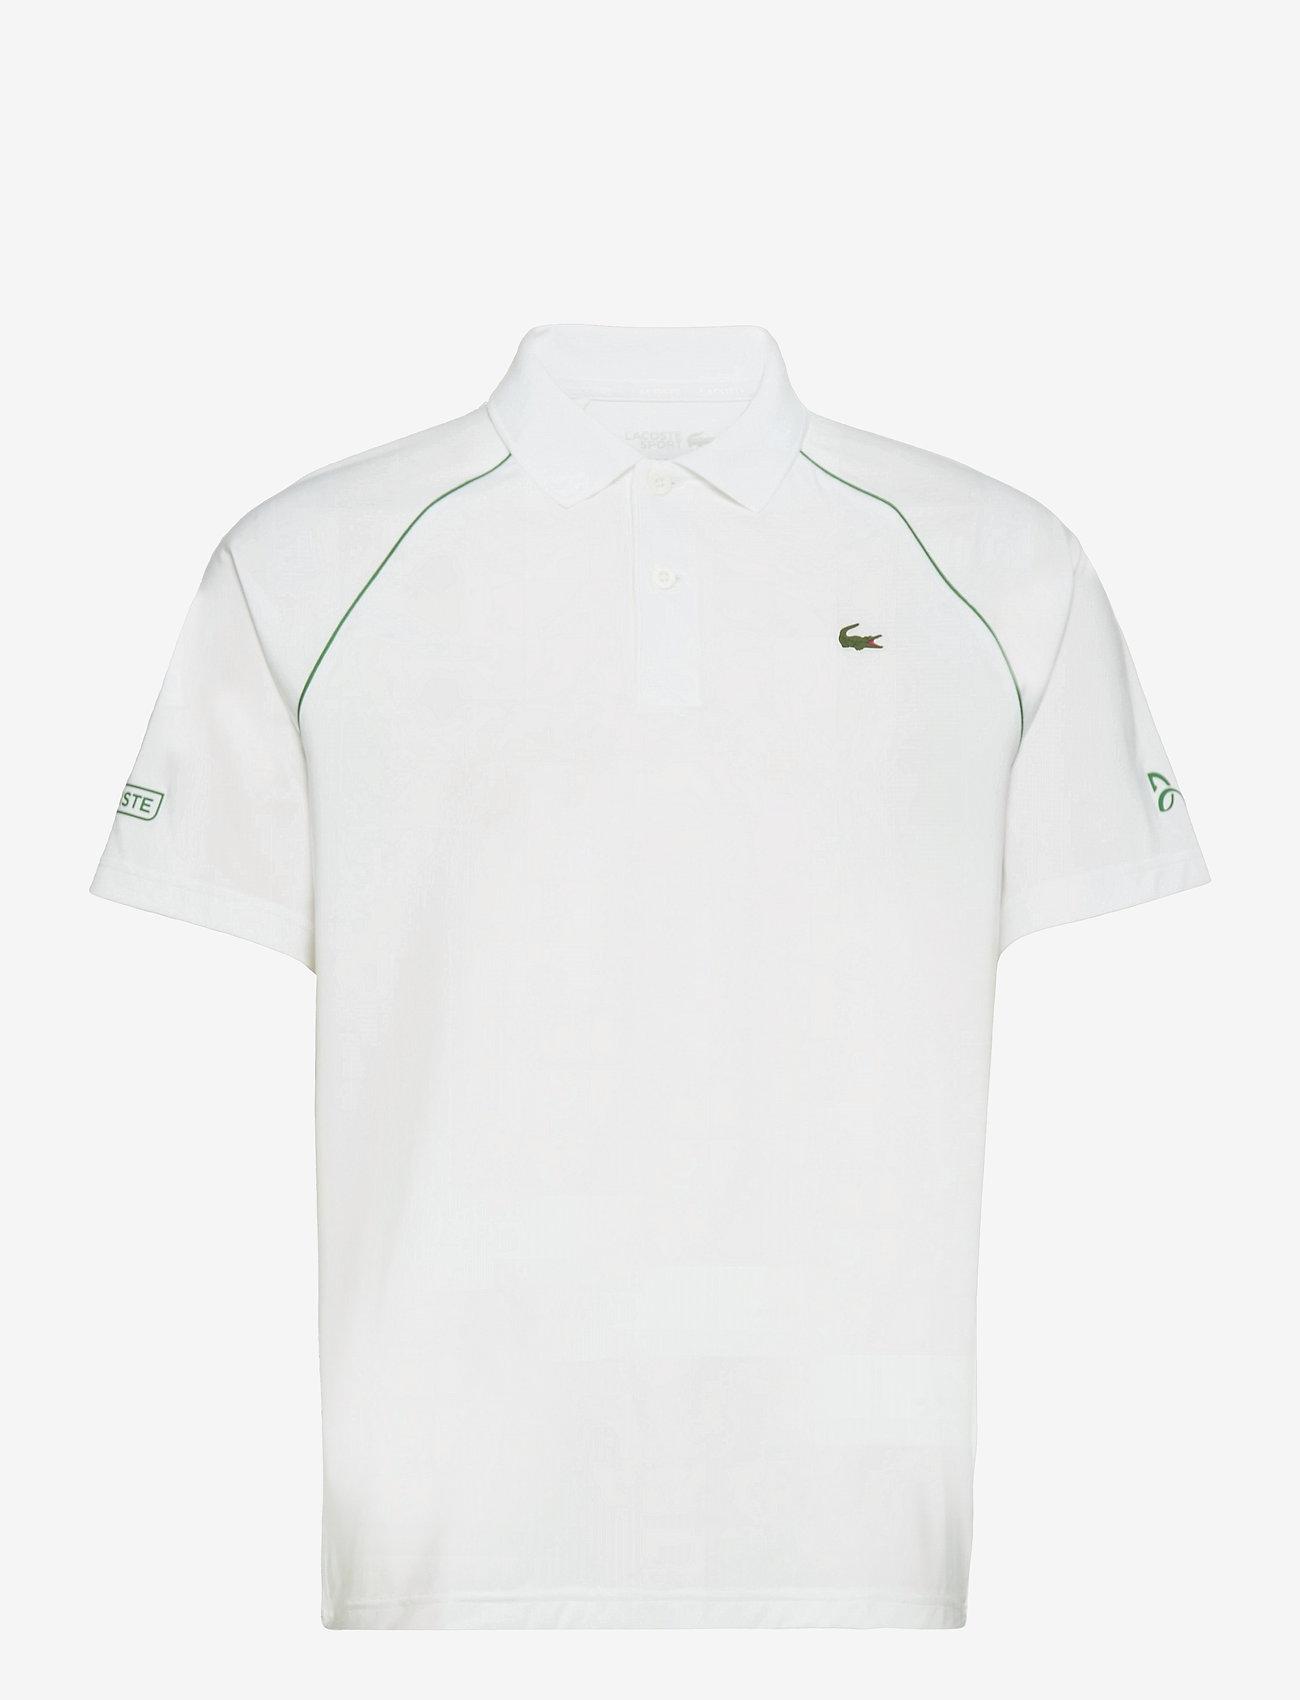 Lacoste - Men s S/S polo - kortærmede - white/yucca - 0